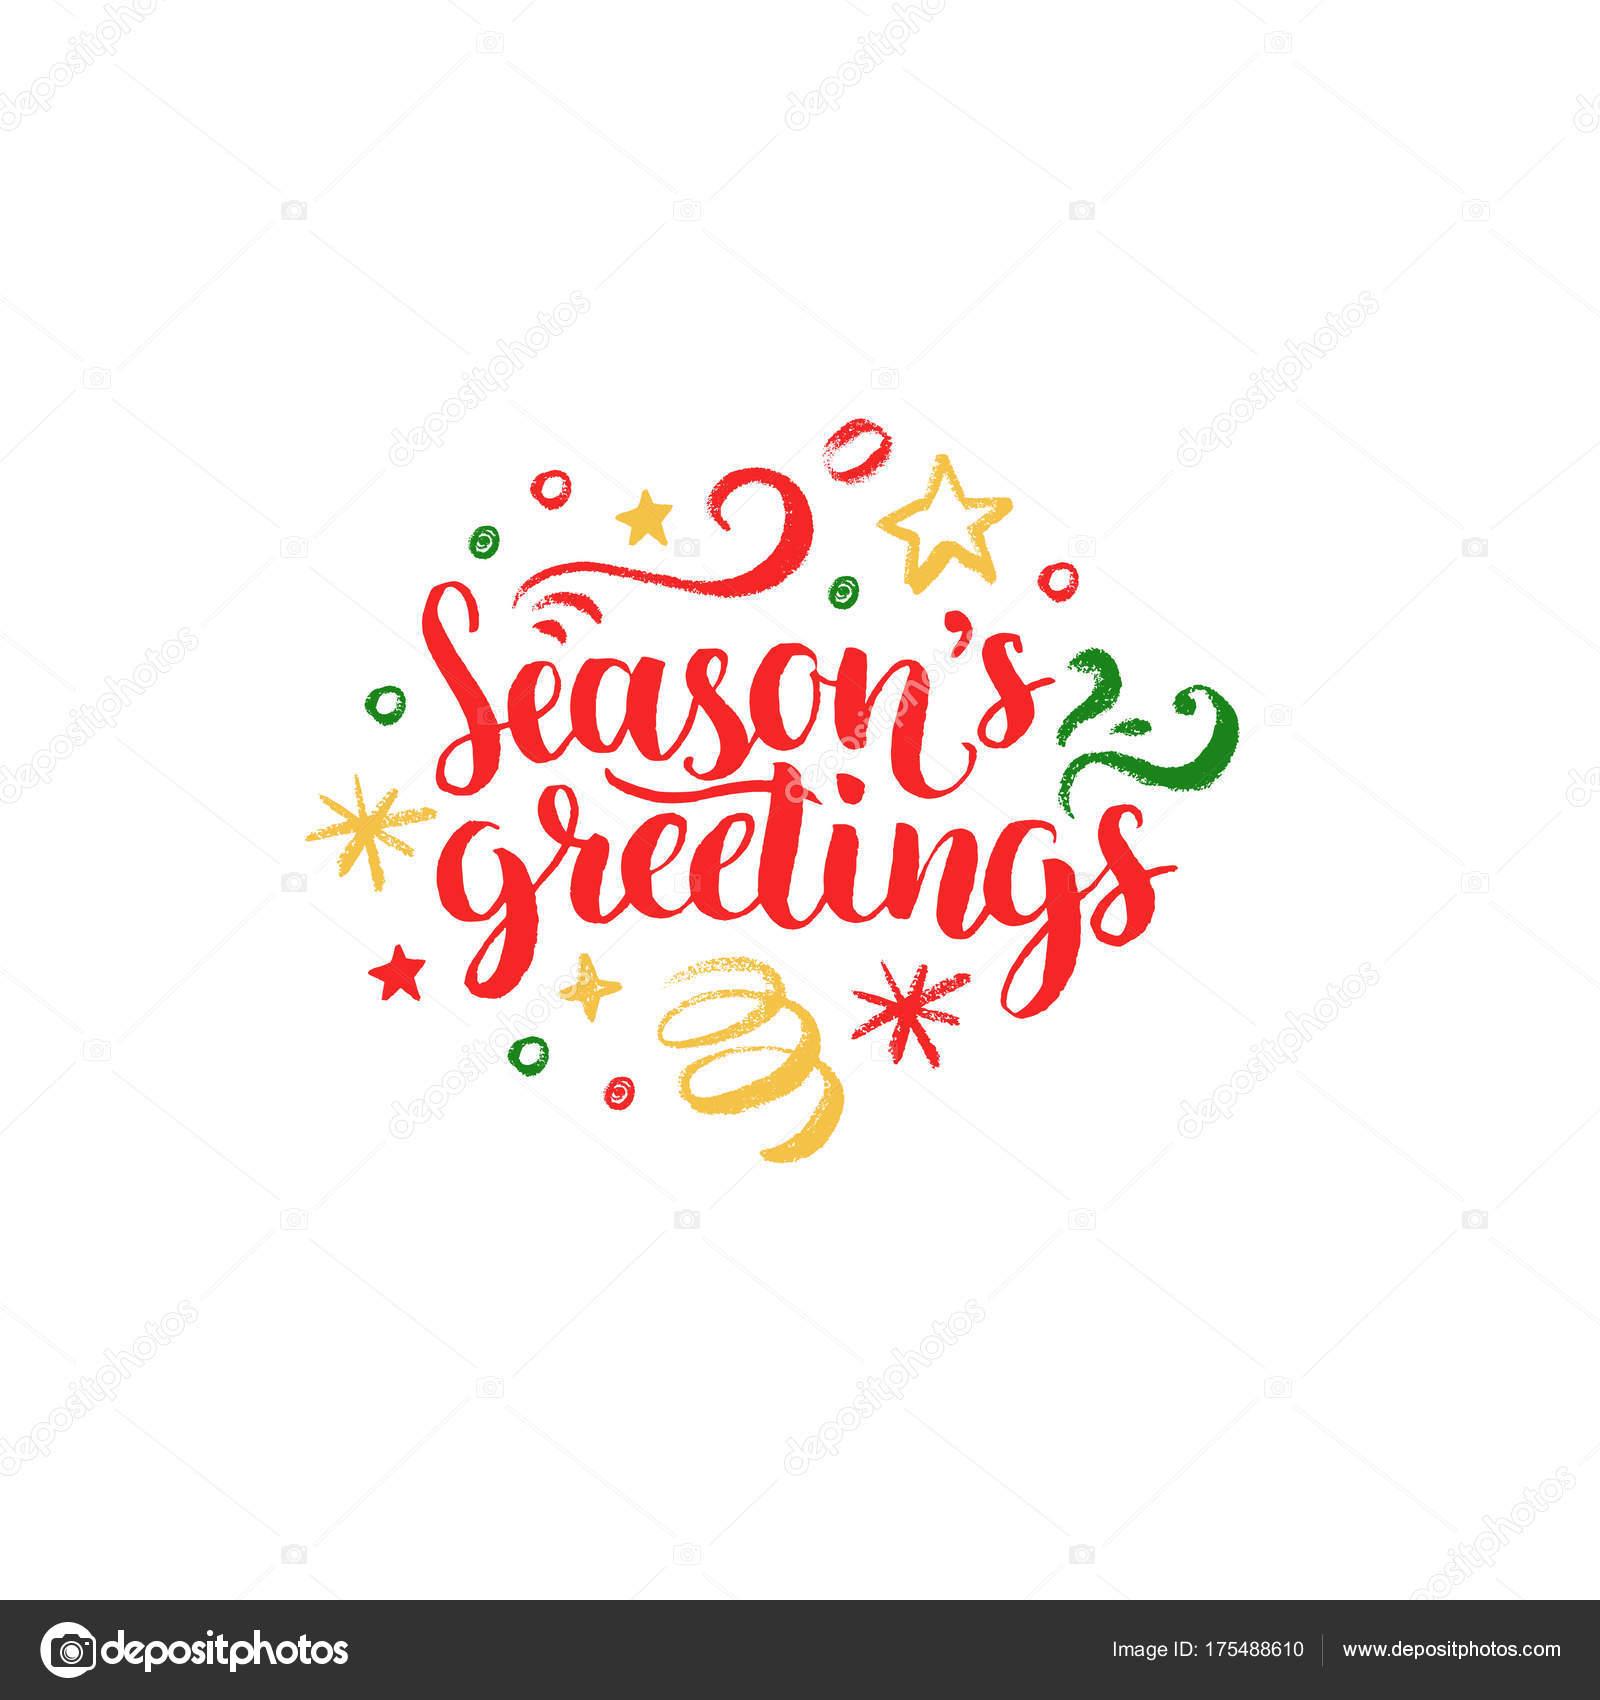 Seasons Greetings Lettering White Background Vector Hand ...